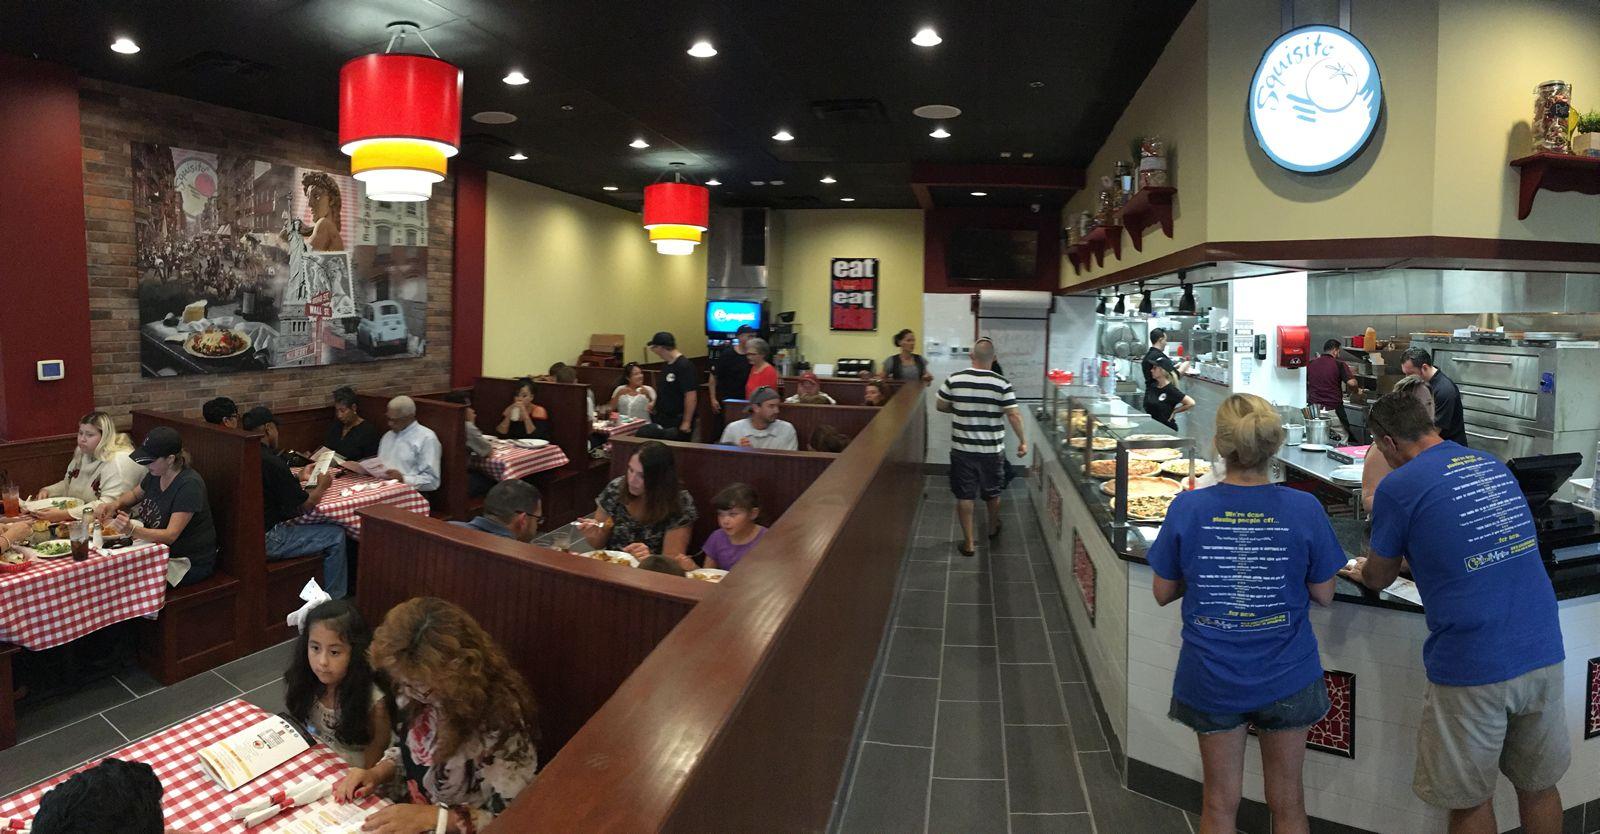 Squisito Pizza & Pasta in Ashburn, VA is Now Open